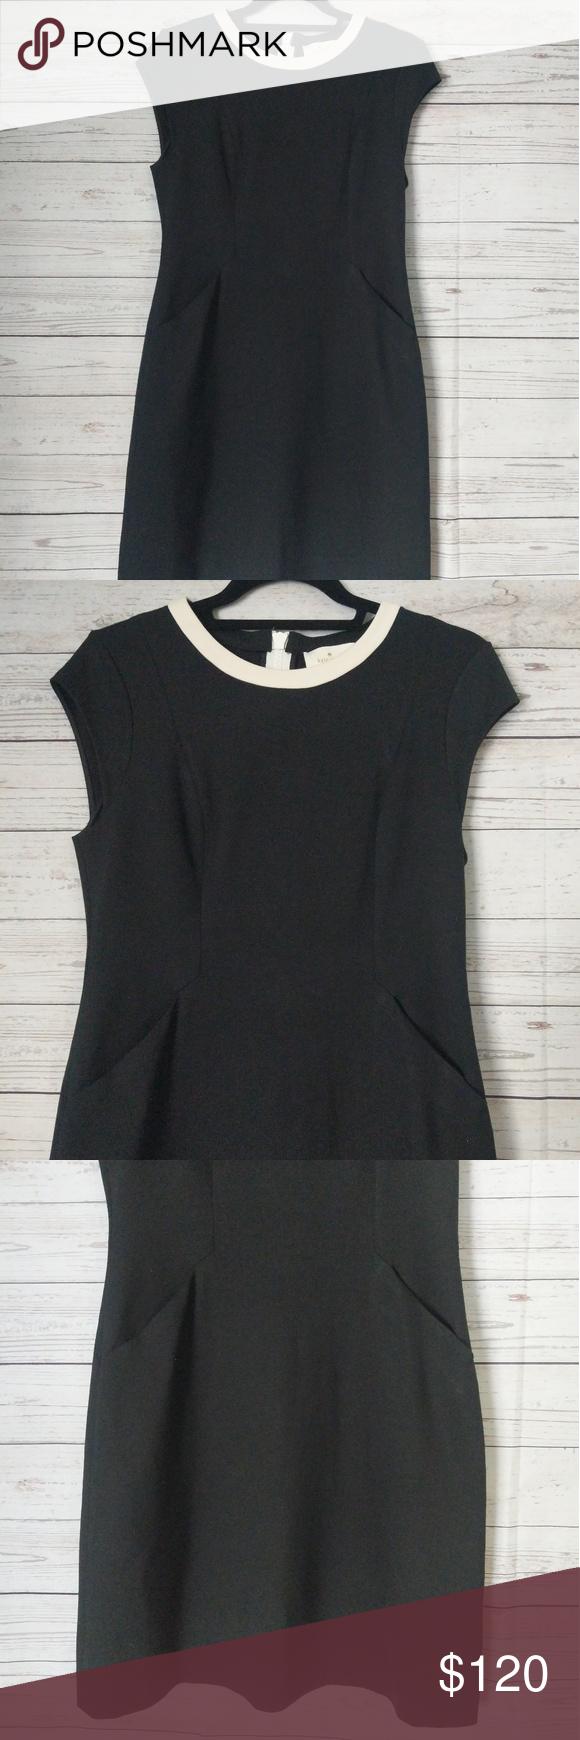 Kate Spade Black Dress White Trim Collar Size 6 Simple Black Dress With Two Front Pockets Back Zipper Black Dress White Collar Simple Black Dress Black Dress [ 1740 x 580 Pixel ]